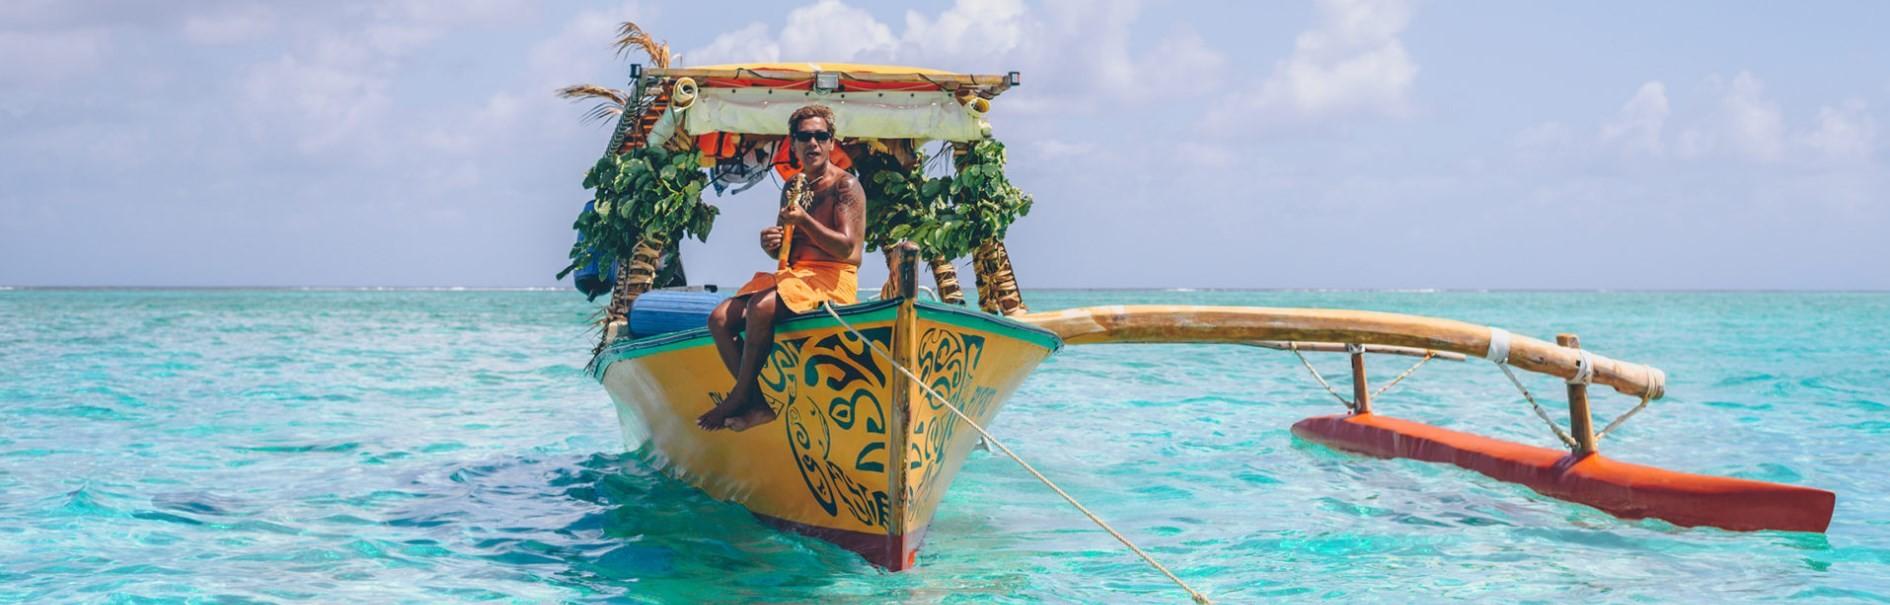 news-main-musique-en-polynesie-sevade-en-ligne.1615394757.jpg